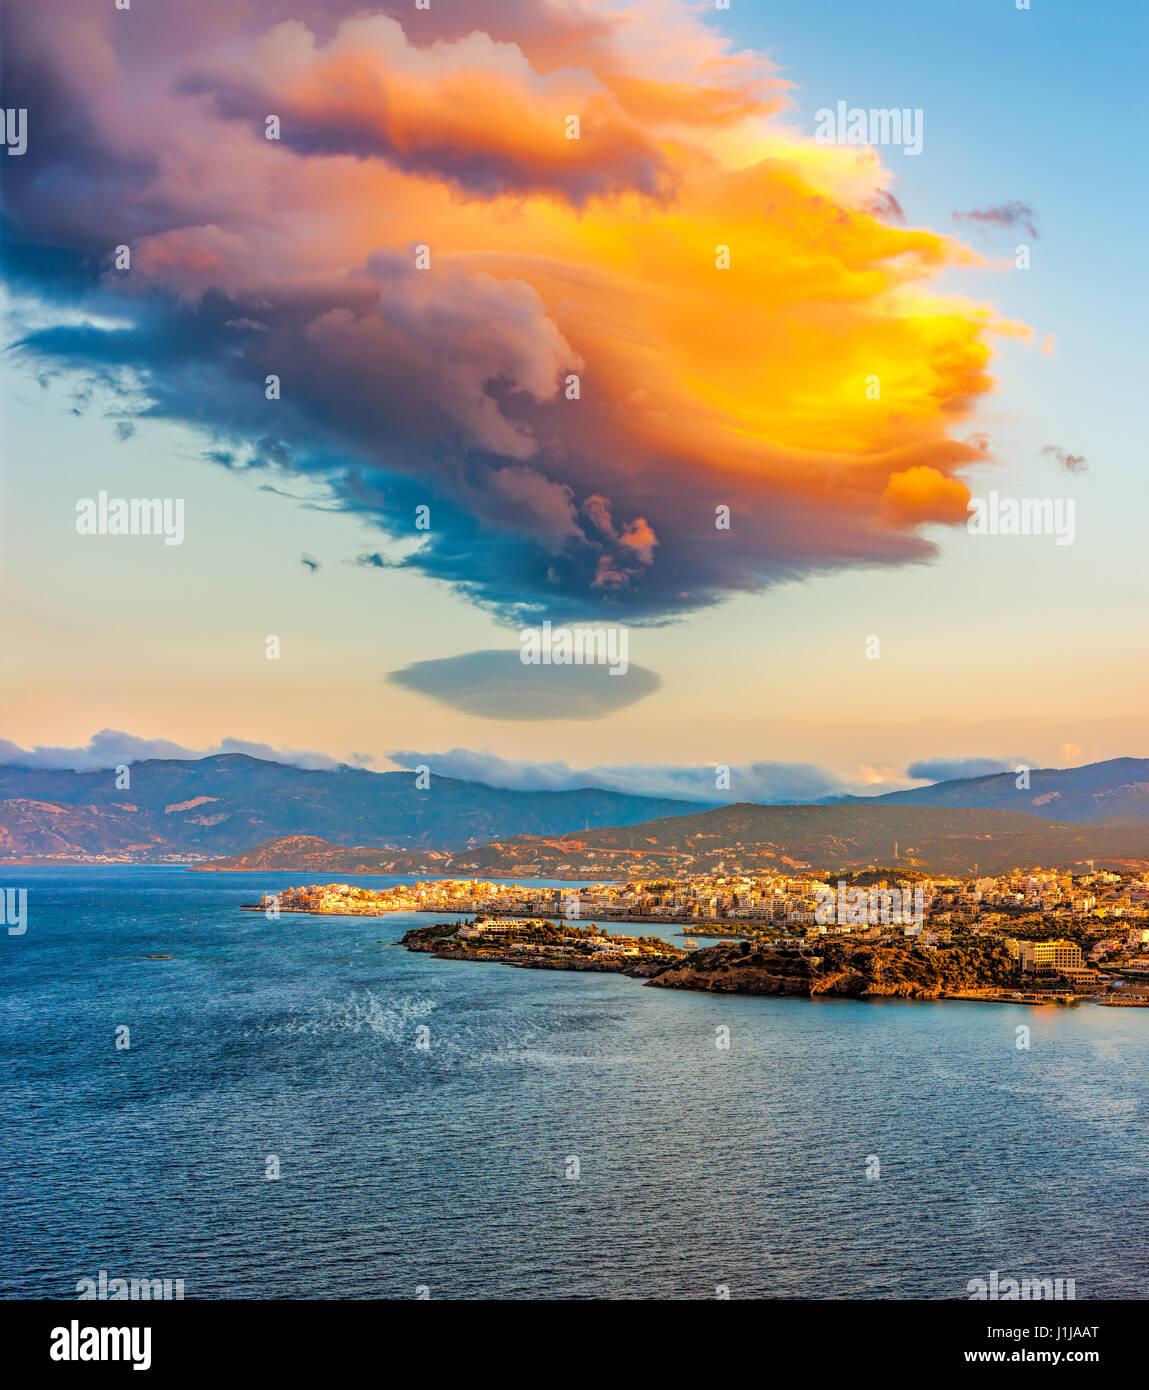 Sunset over the island of Crete, the Bay of Mirabella and Agios Nikolaos, Crete, Greece. - Stock Image